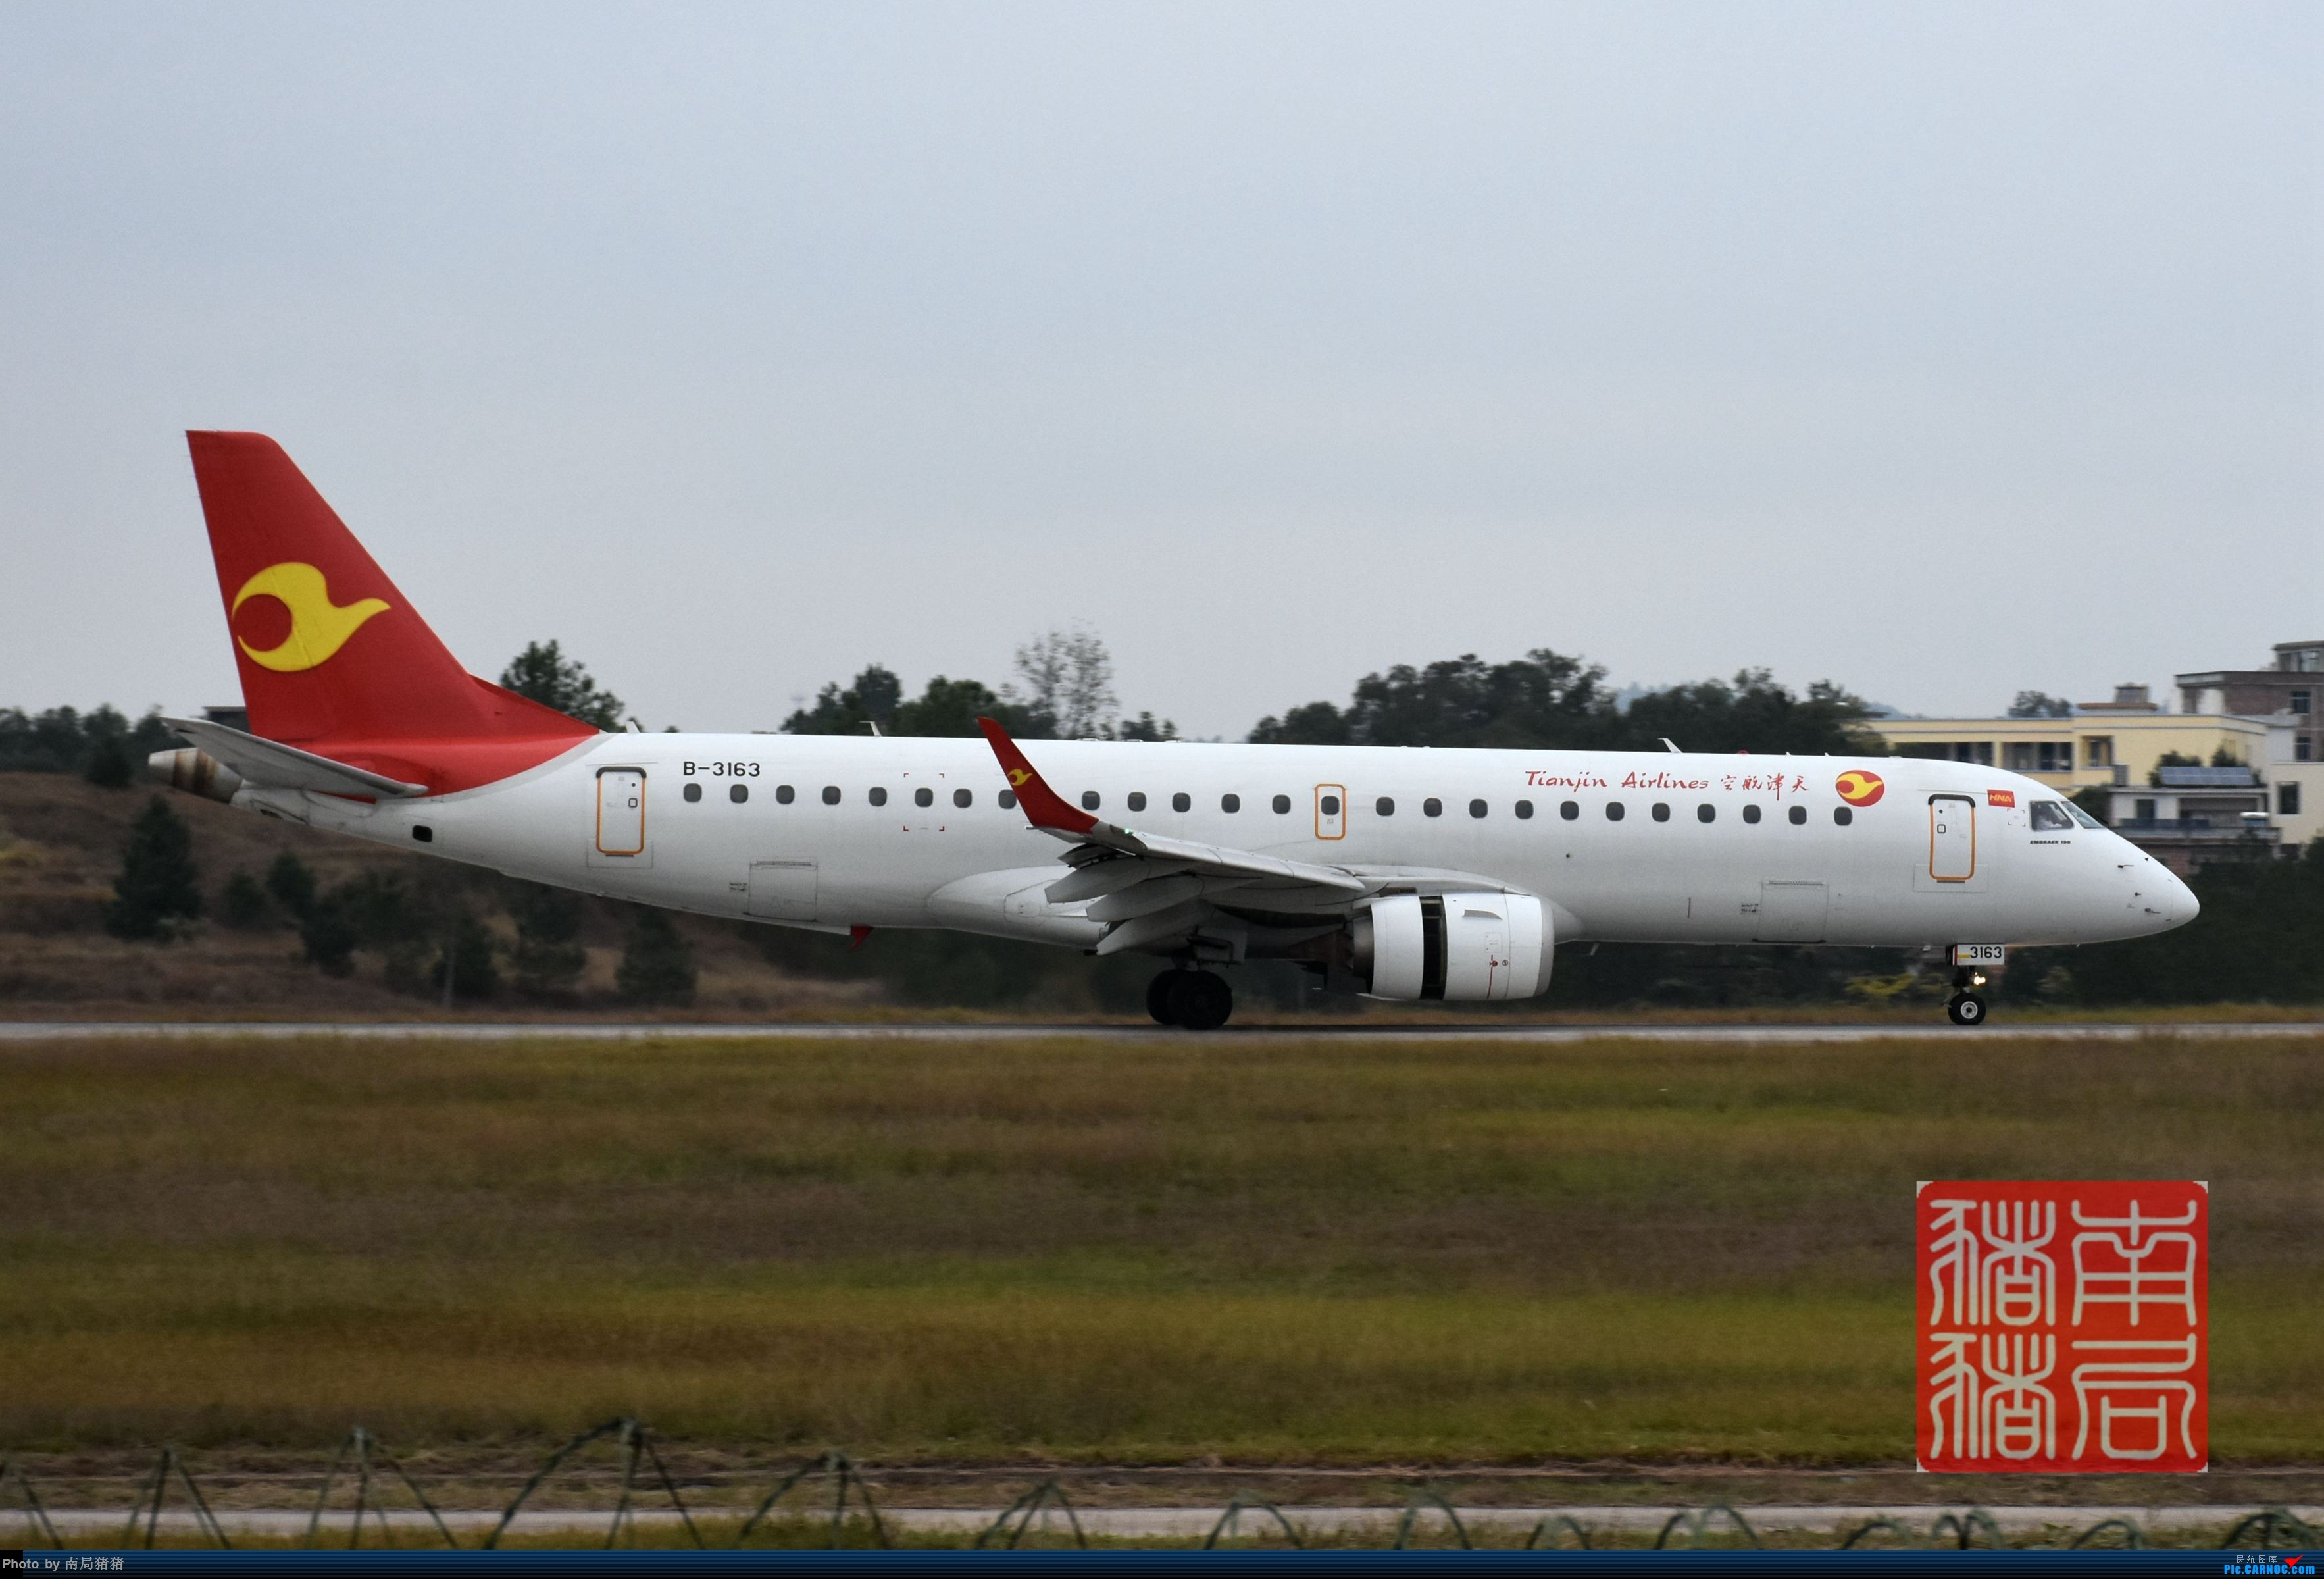 Re:[原创]KOW赣州黄金机场(通航运12,北部湾变形金刚) EMBRAER E-190 B-3163 中国赣州黄金机场